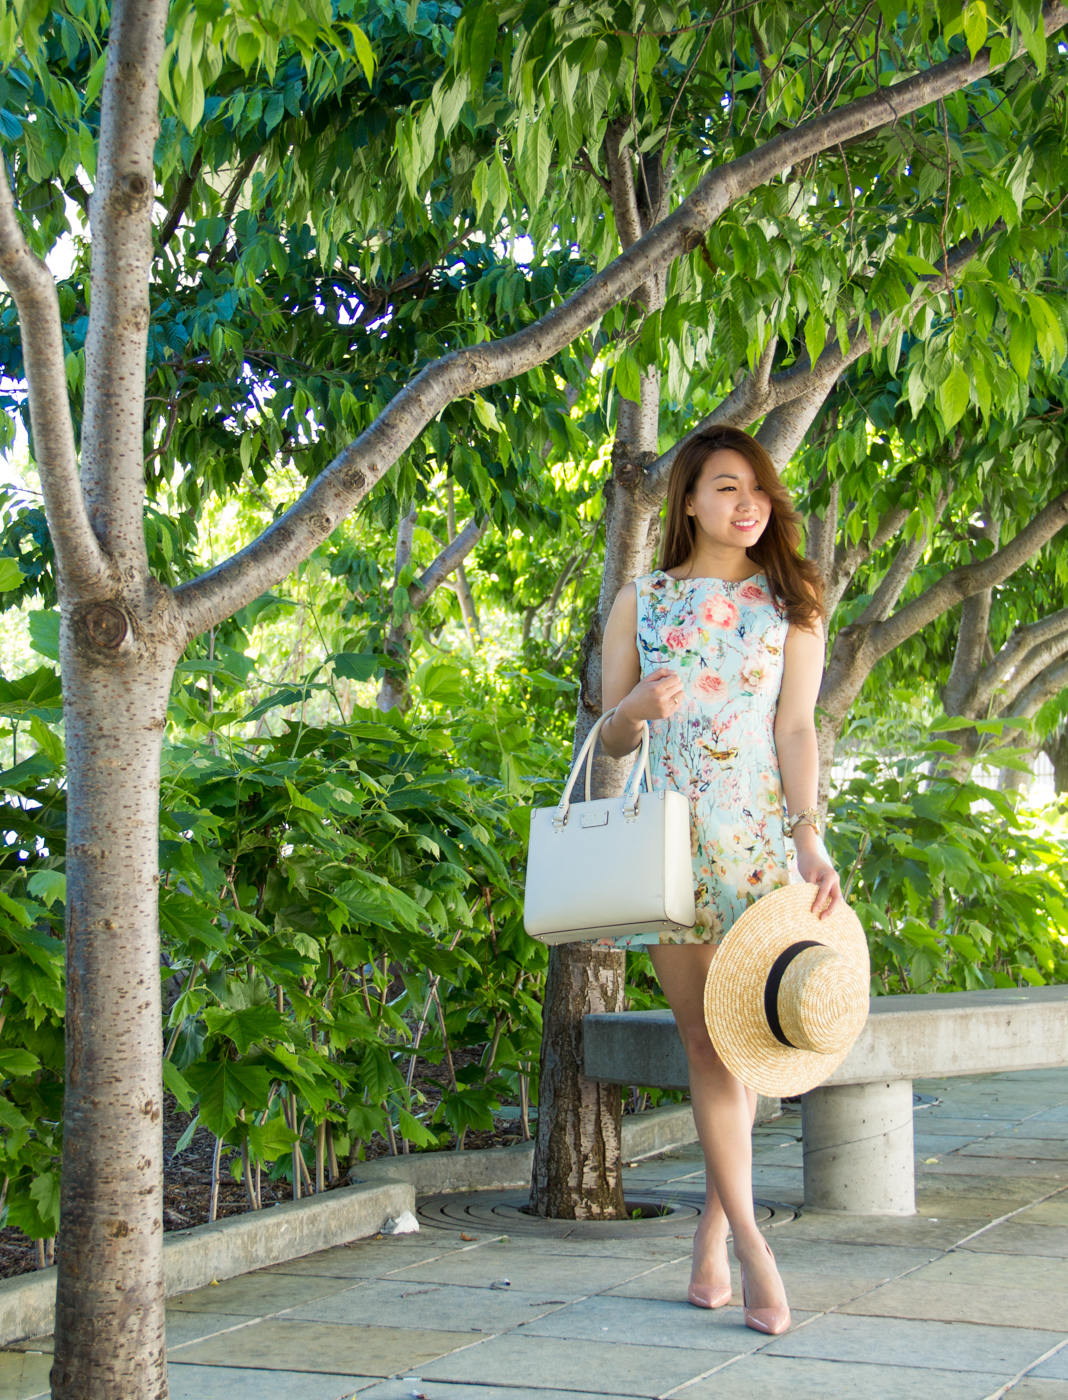 06.30.16: Summer Blooms | Straw Hat & Floral A-Line Dress